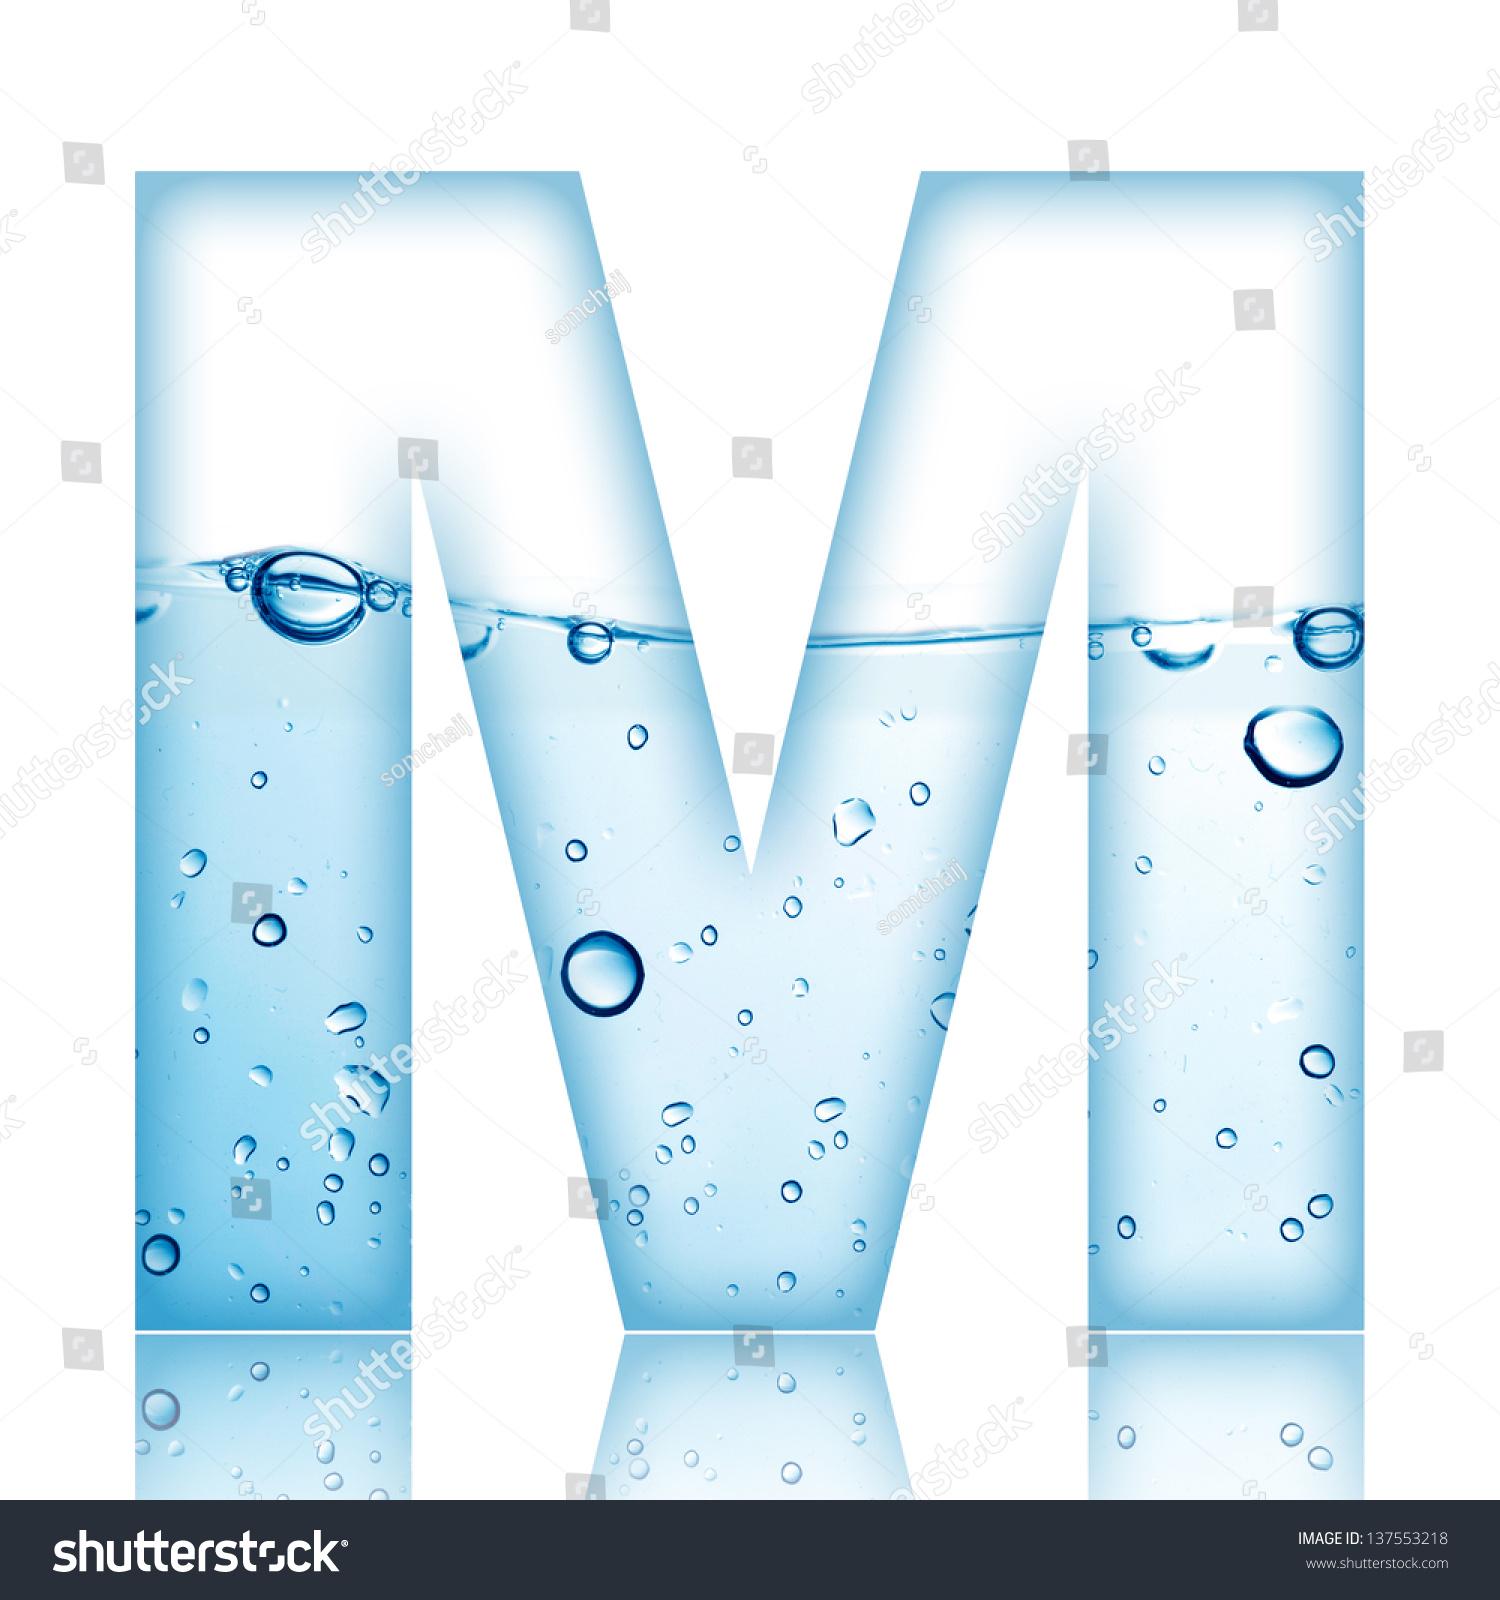 Water Water Bubble Alphabet Letter Letter Stock